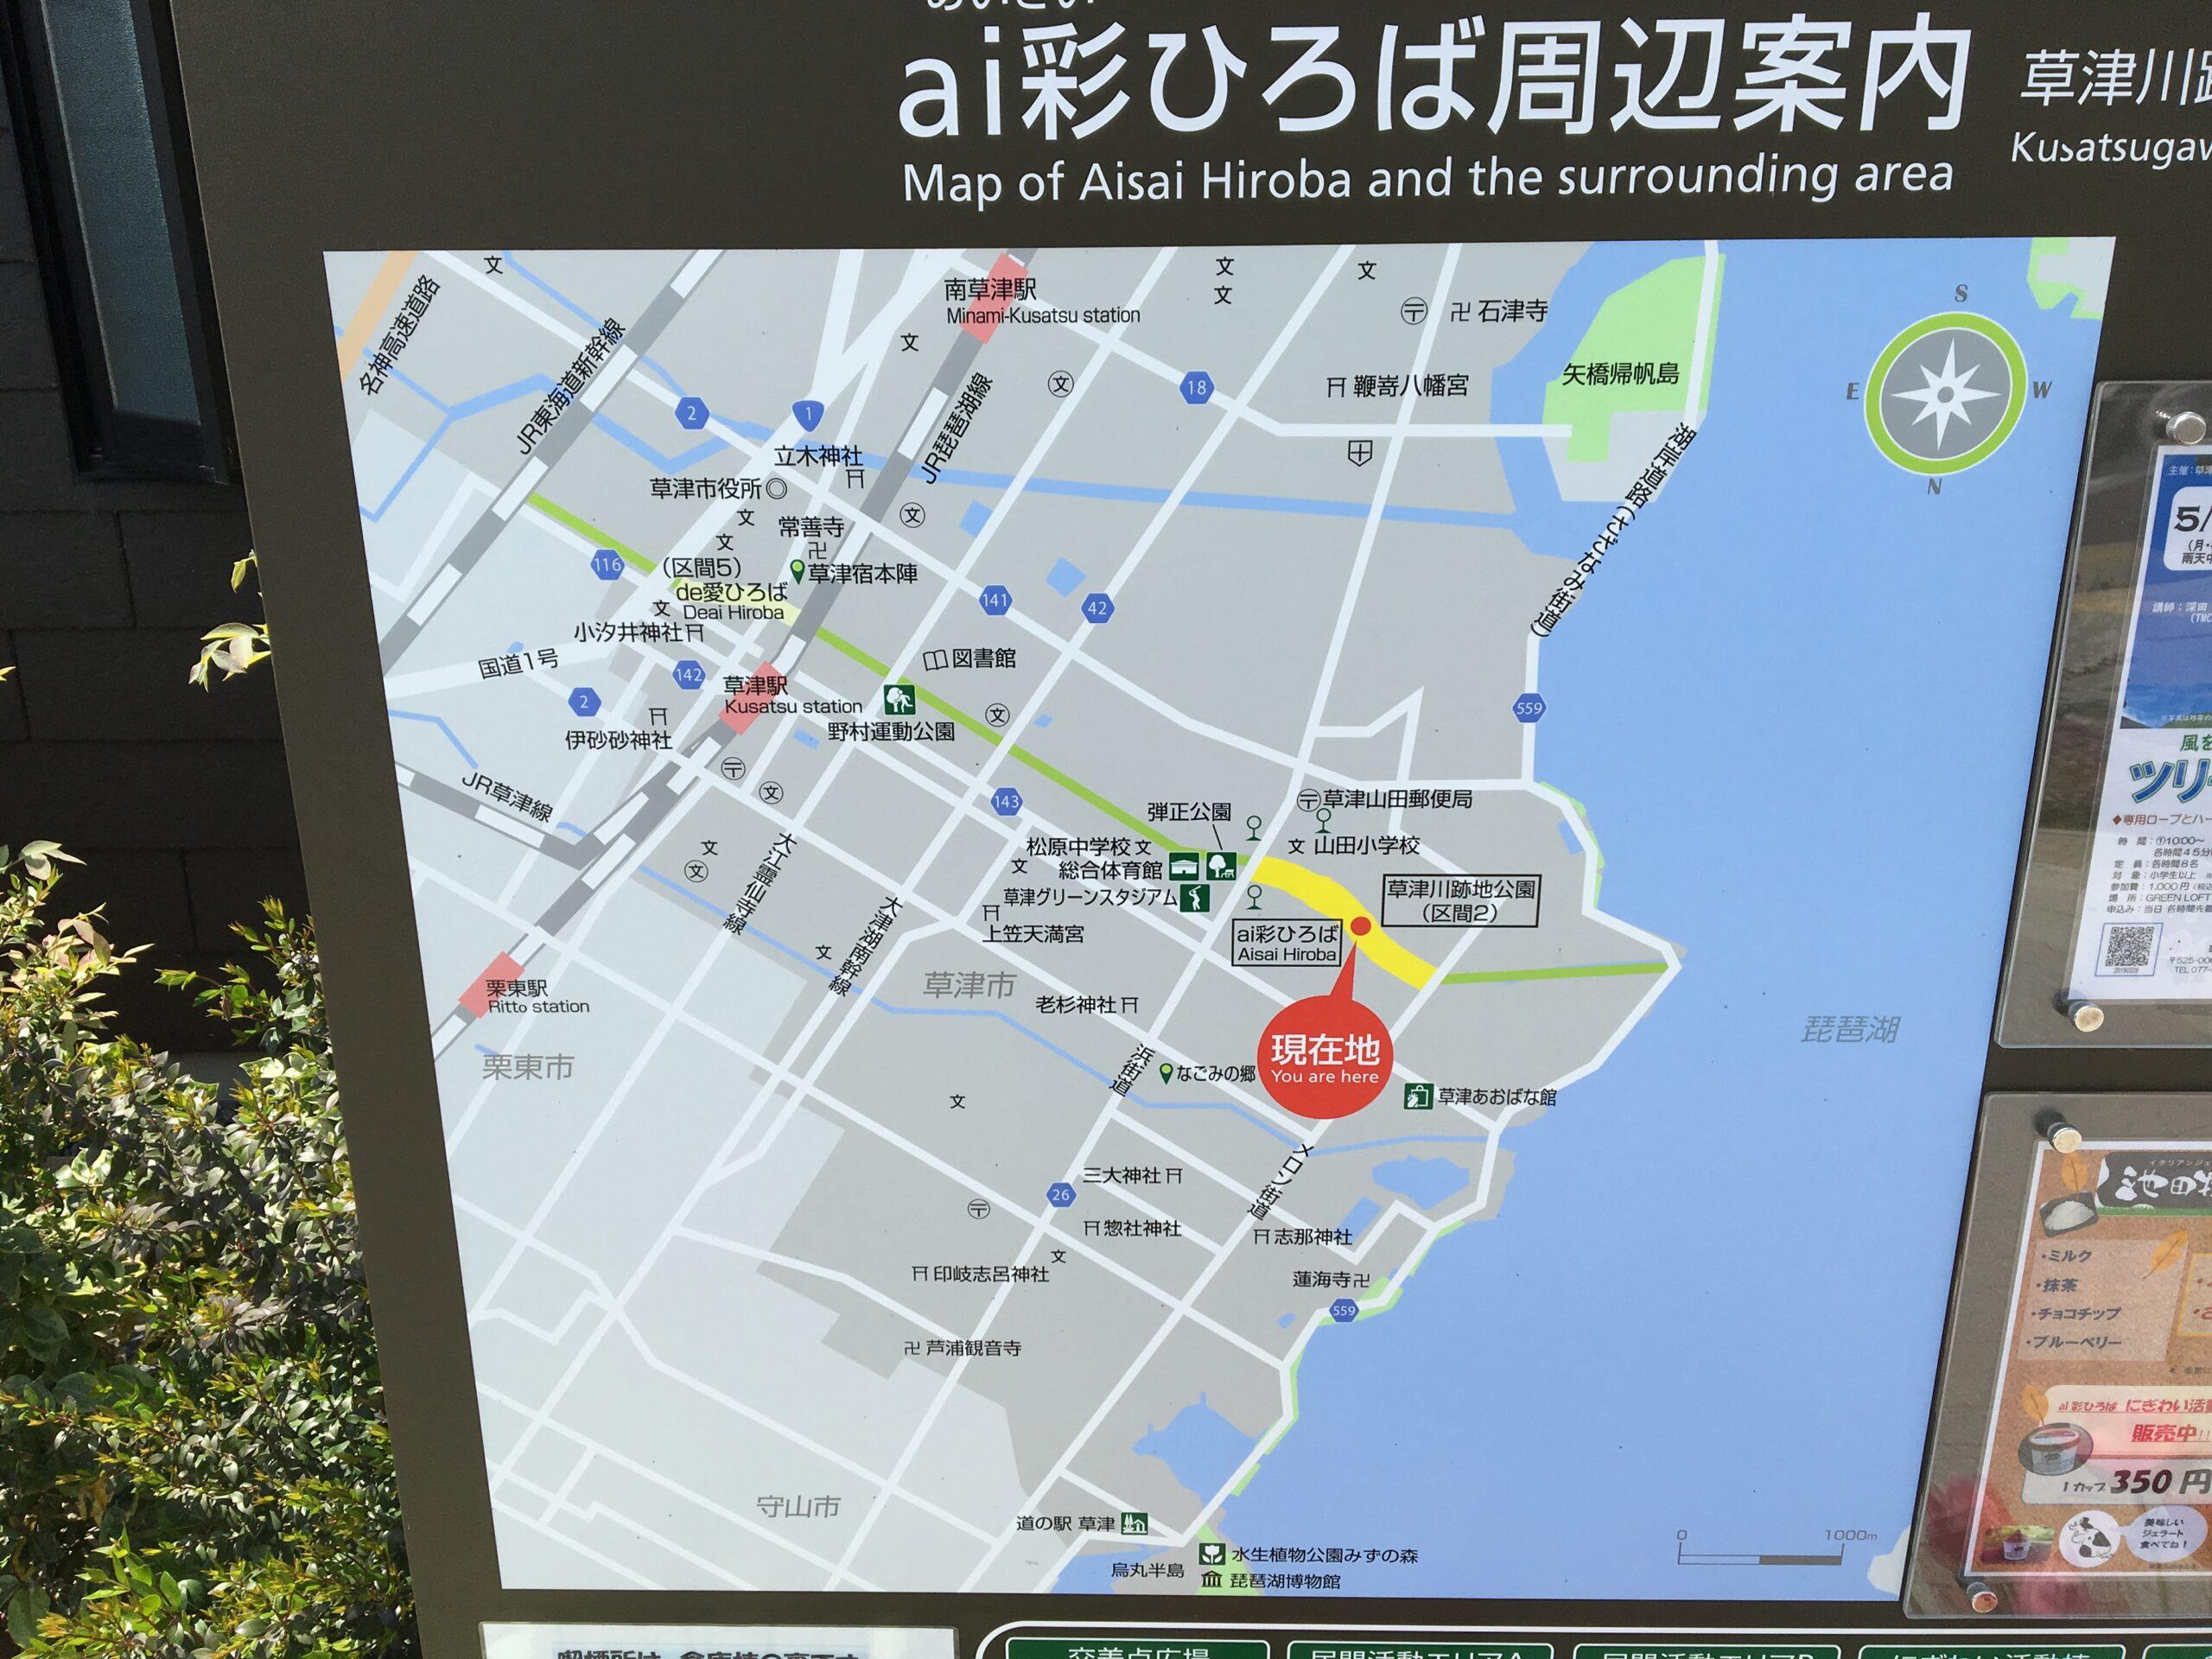 ai彩ひろばの周辺案内地図画像